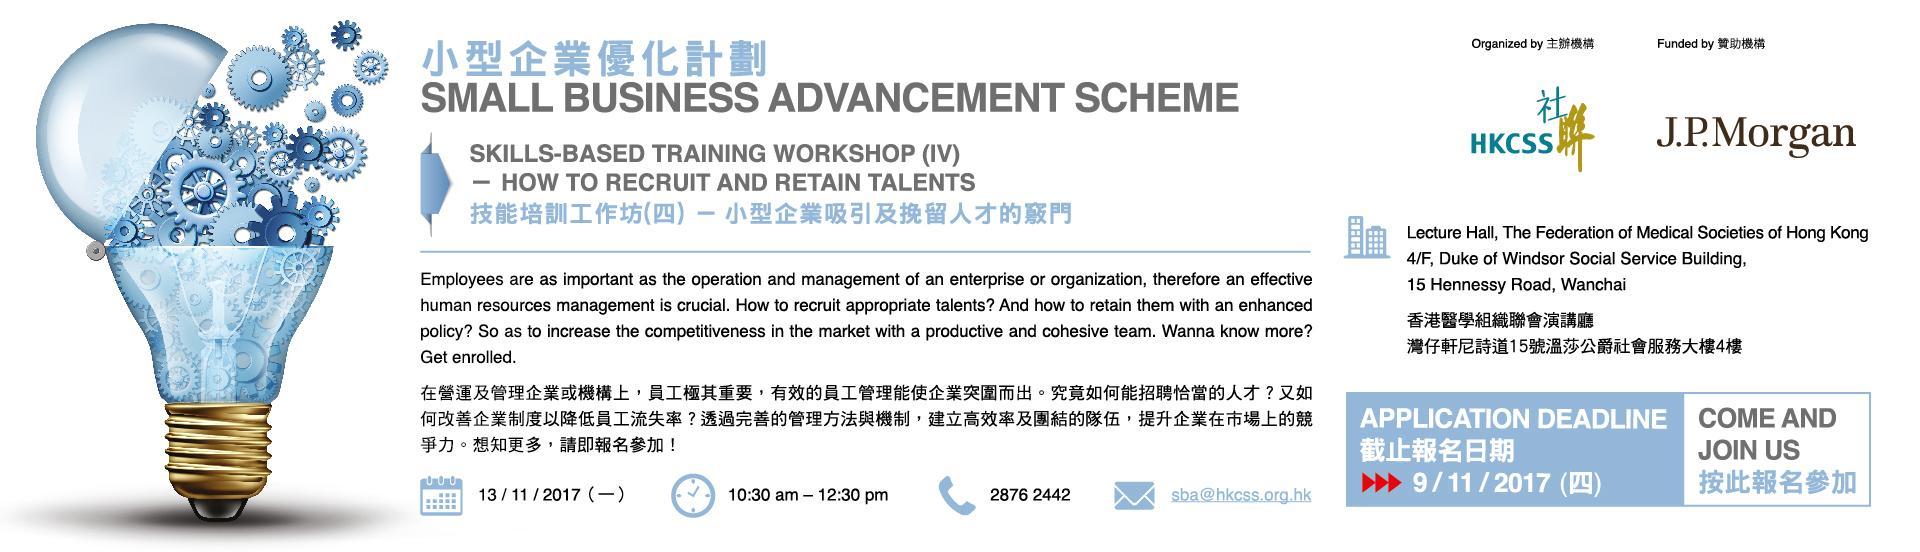 Small Business Advancement Scheme Skills-based Training Workshop (IV)